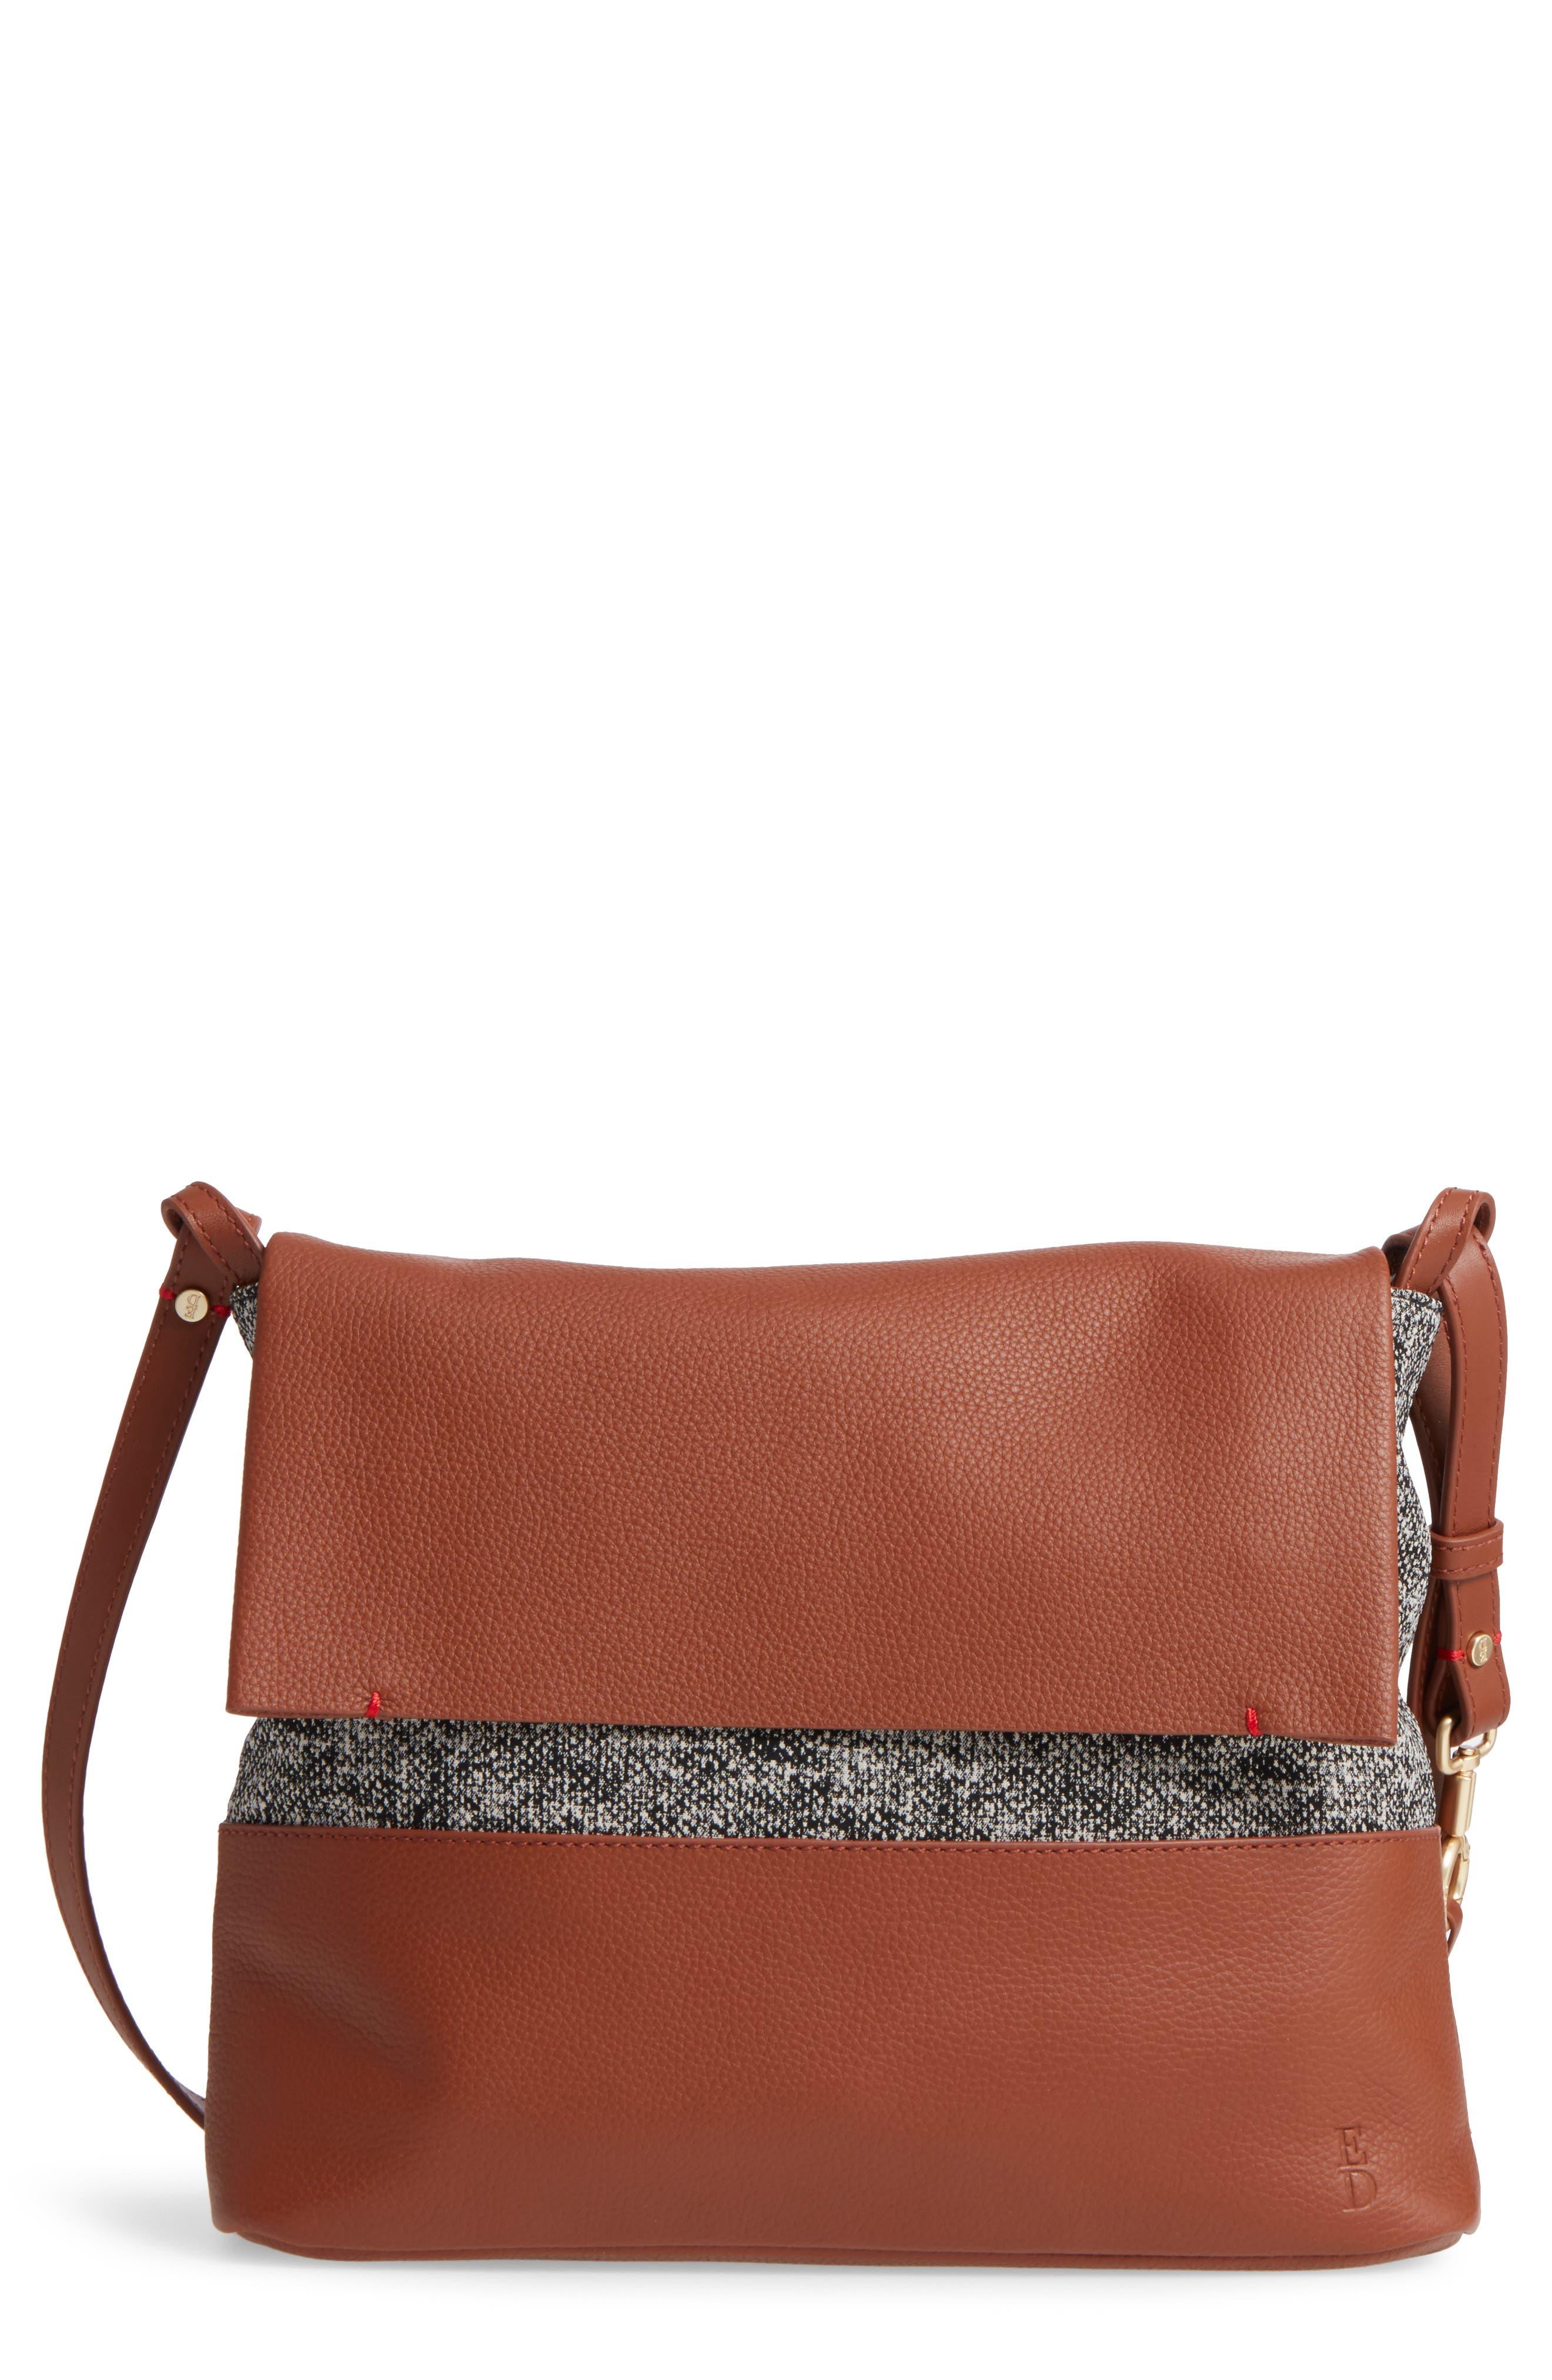 Medium Brea Crossbody Bag,                             Main thumbnail 1, color,                             Whiskey